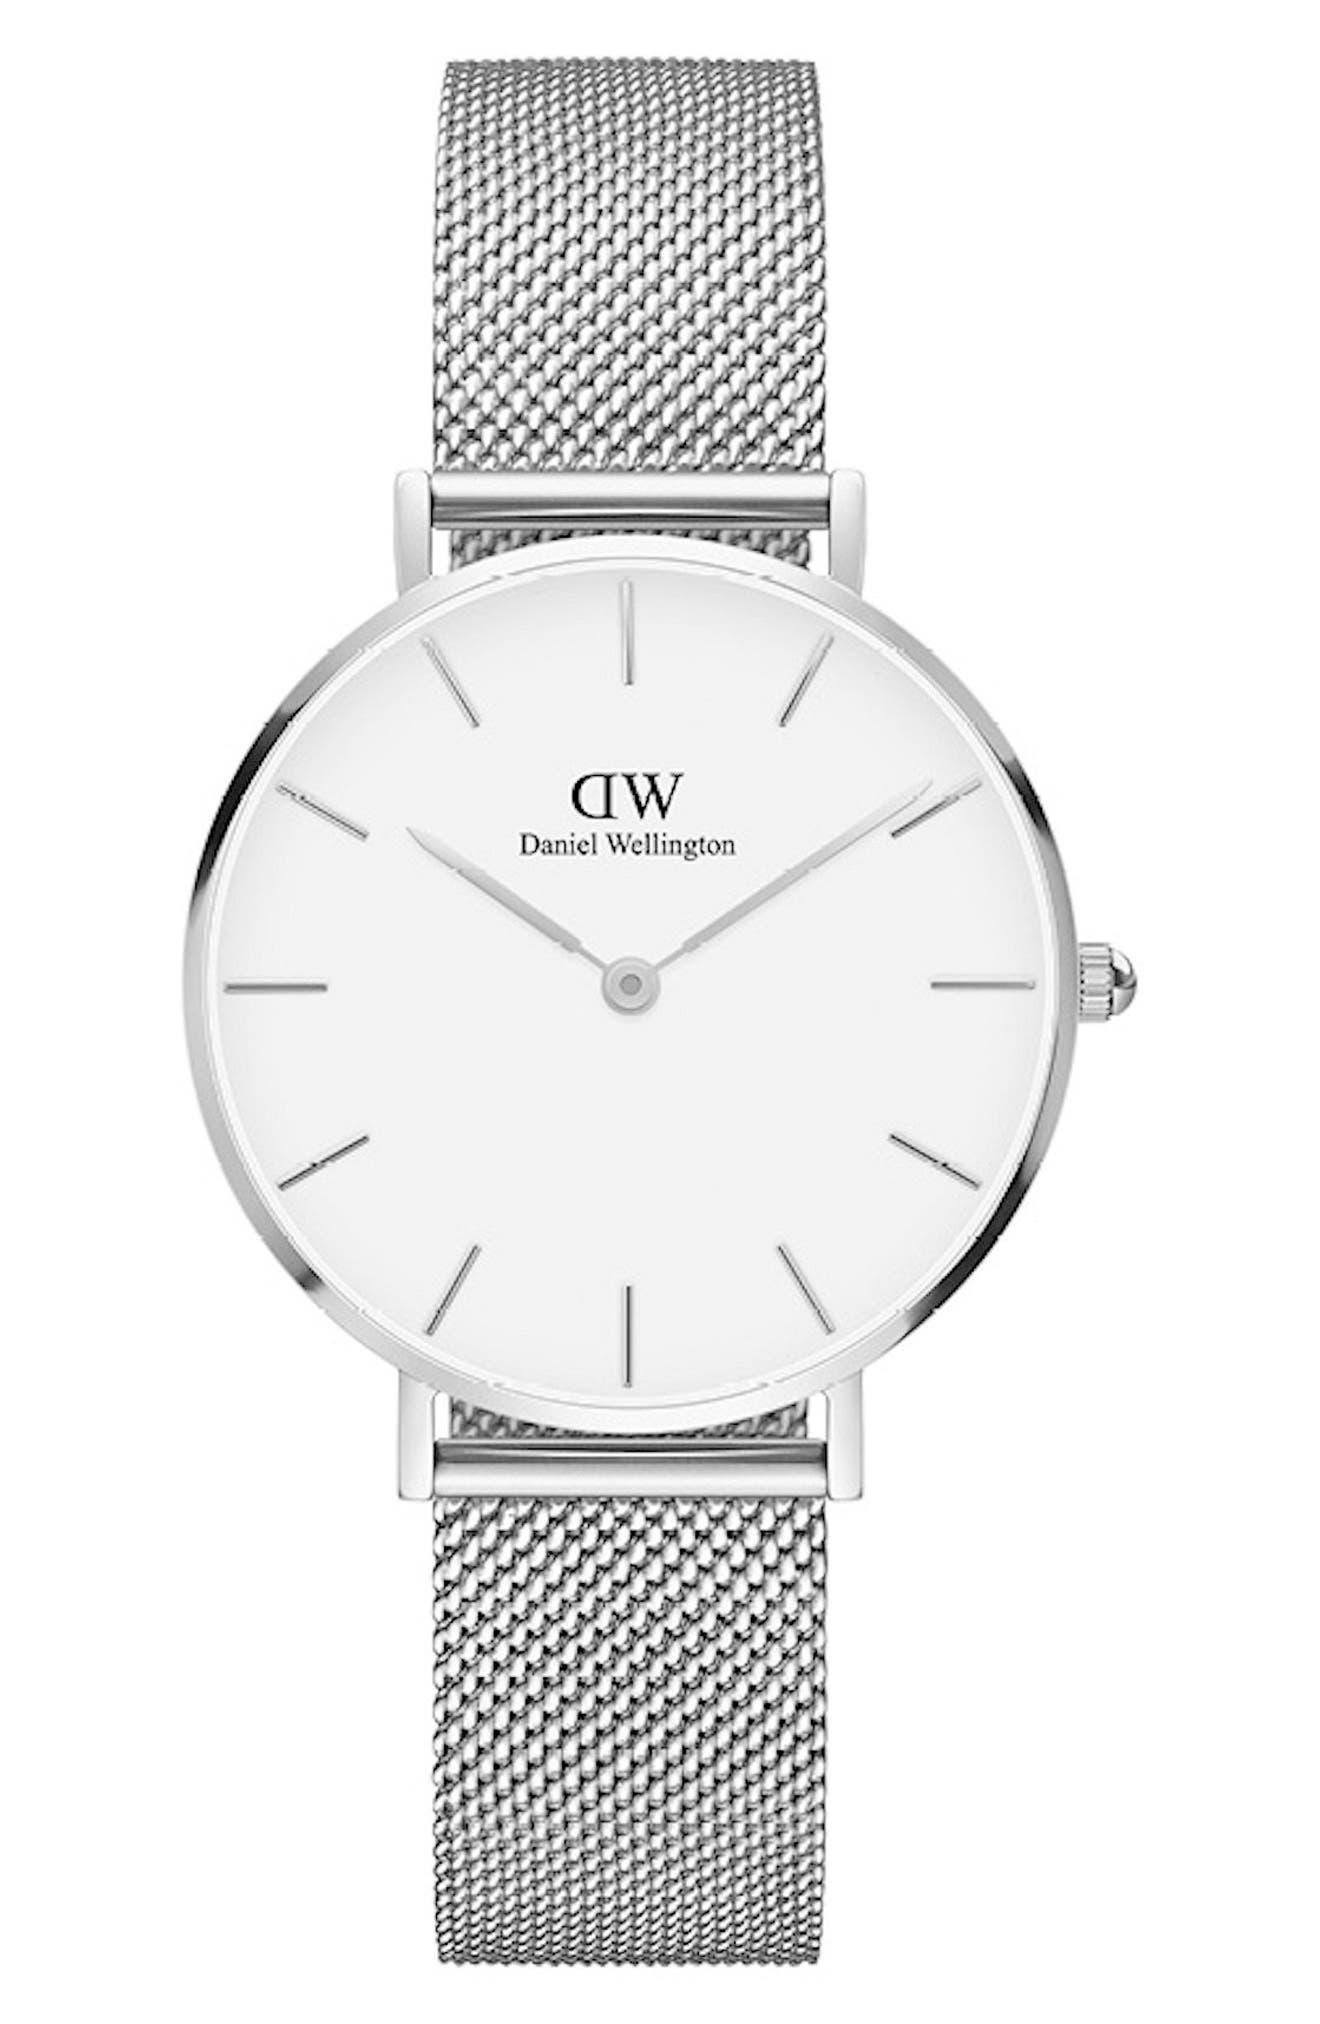 DANIEL WELLINGTON Classic Petite Mesh Strap Watch, 32mm, Main, color, SILVER/ WHITE/ SILVER